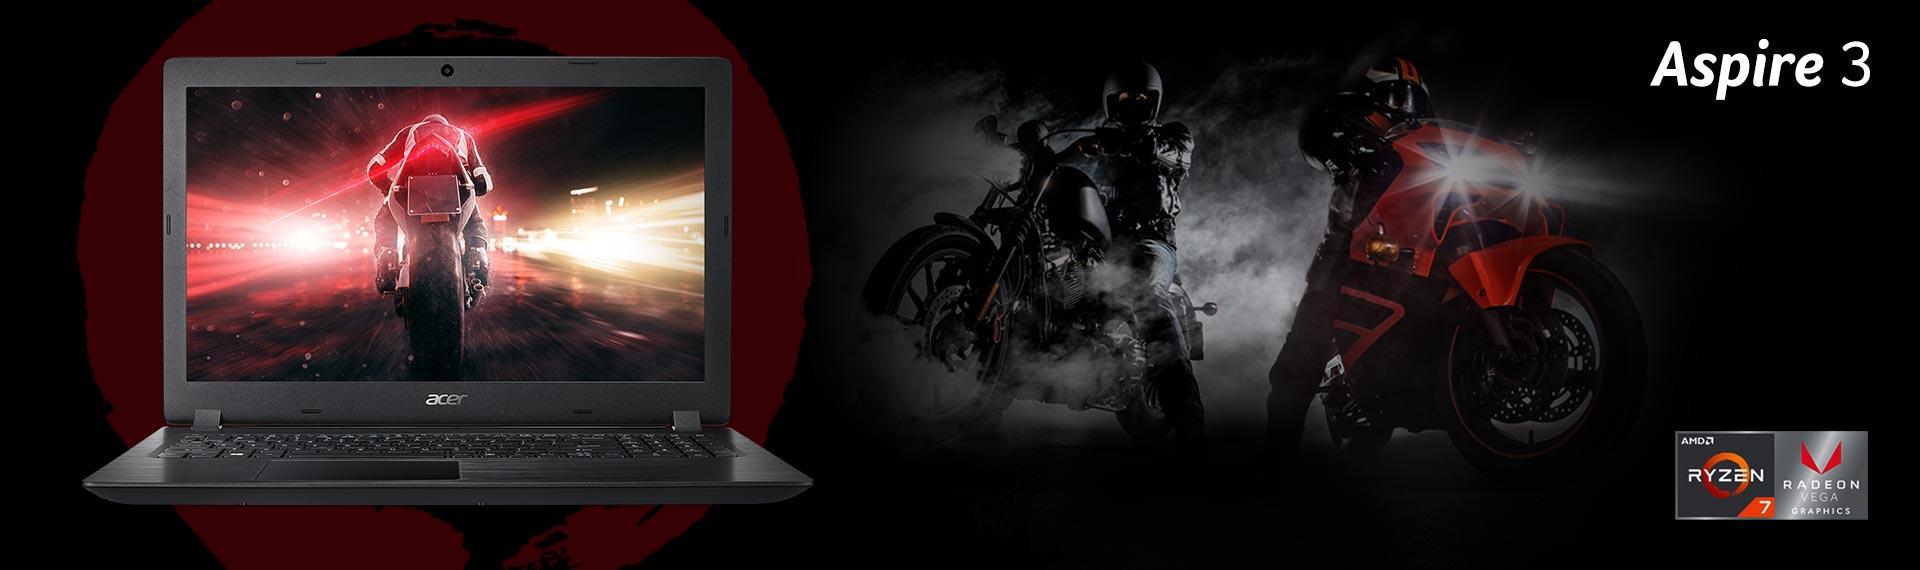 Acer Aspire 3, Tipis dan Super Kuat berkat Prosesor AMD Ryzen Terbaru